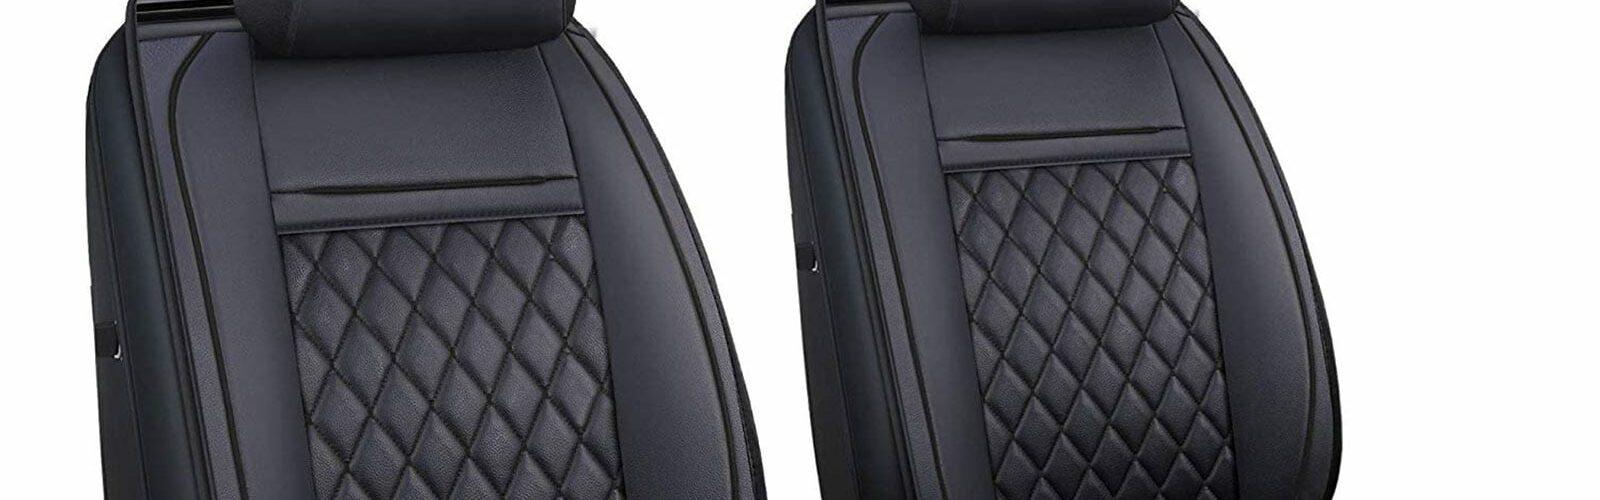 Best Silverado Seat Covers